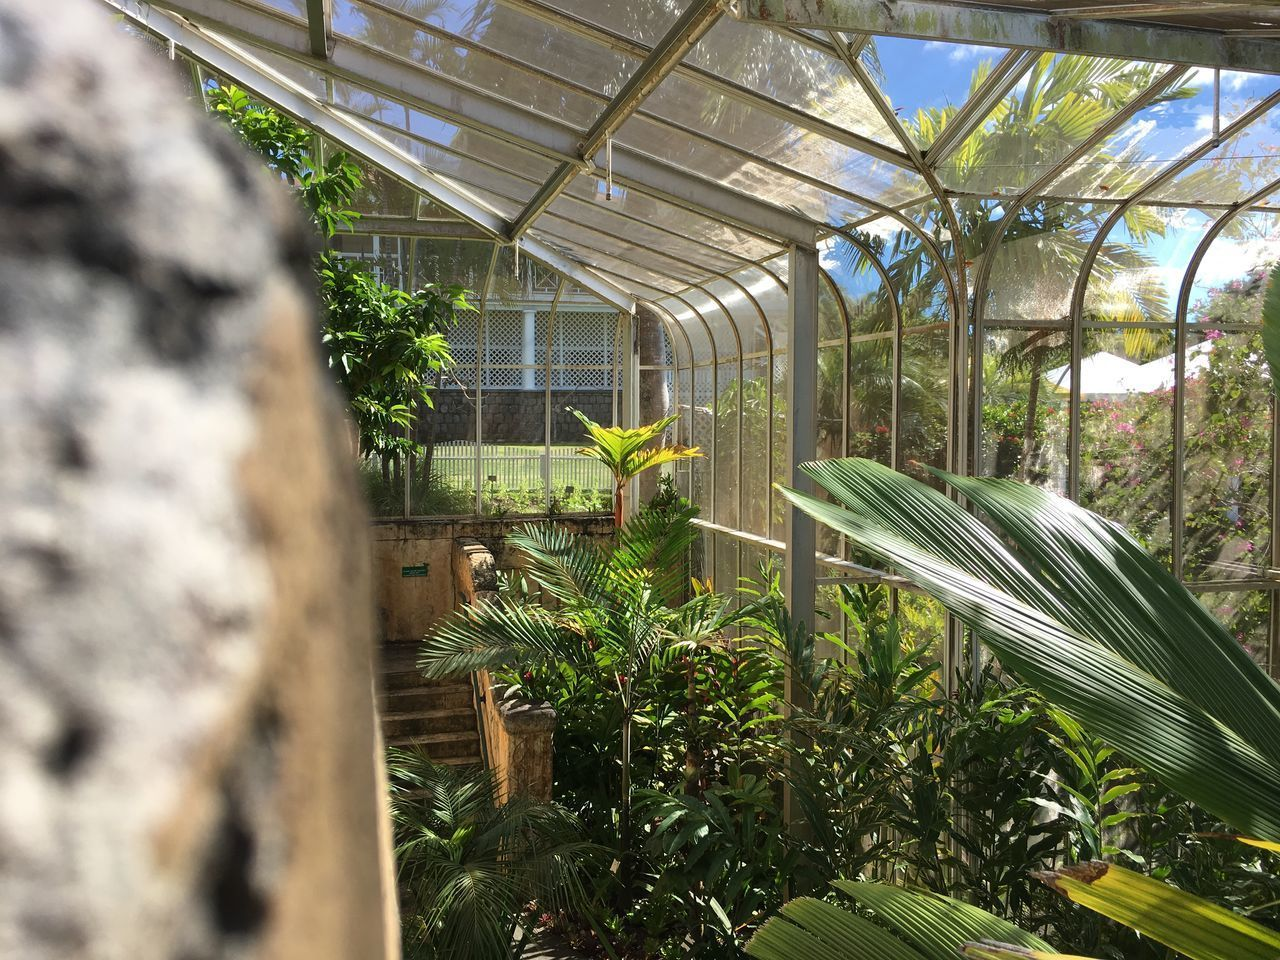 Botanical Gardens Day Deity God Kids Life Nevis Four Seasons Parrot Scenery Spirituality St.KItts&Nevis Volcano